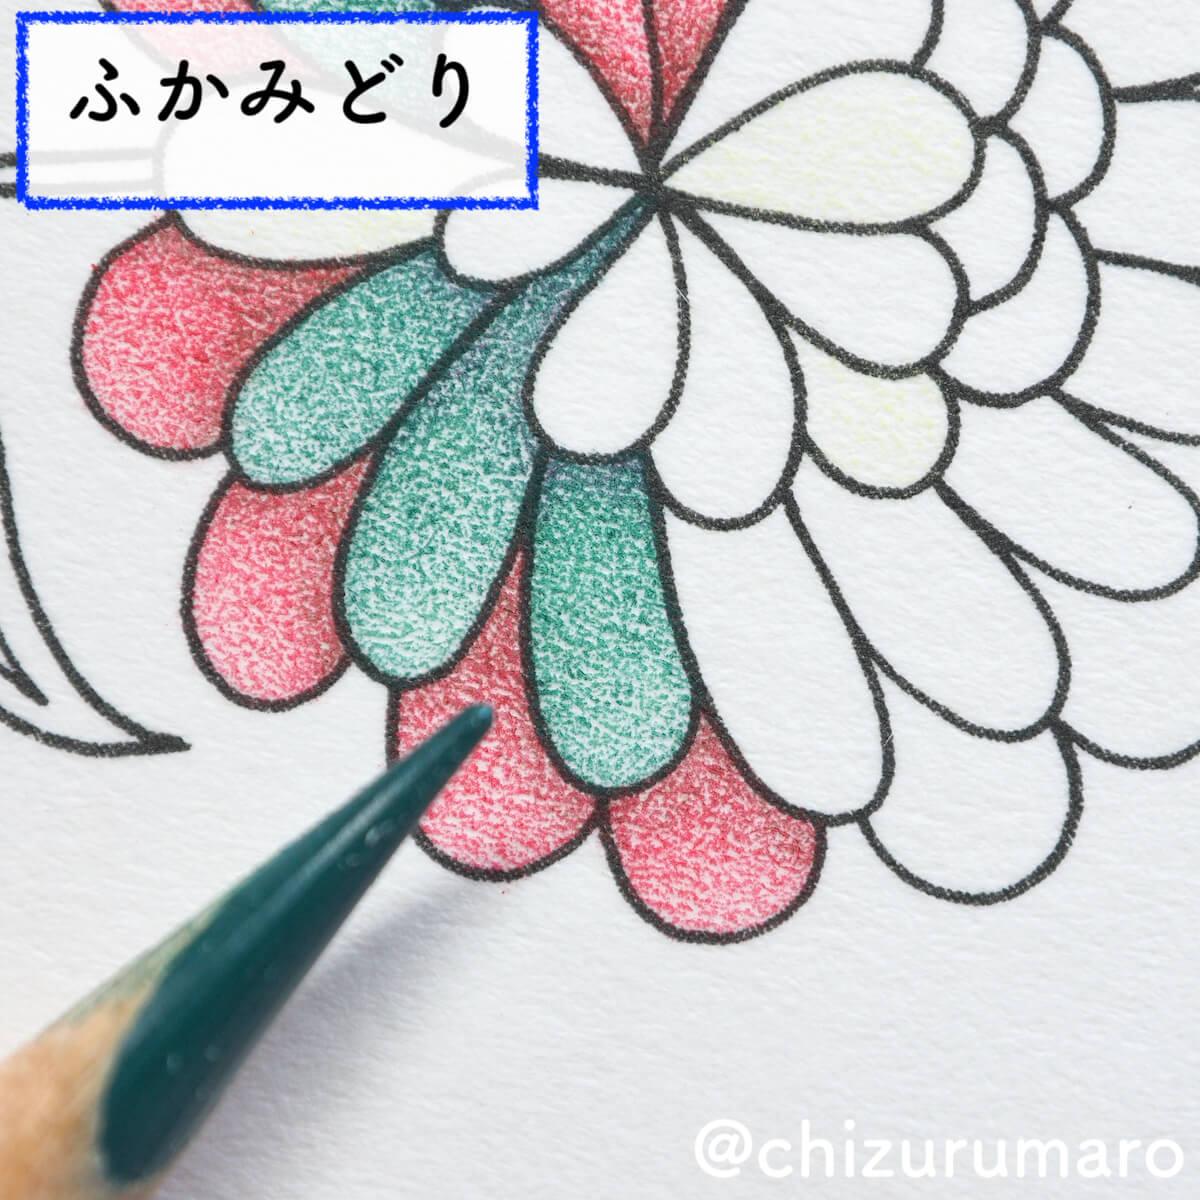 f:id:chizurumaro:20200511125015j:plain